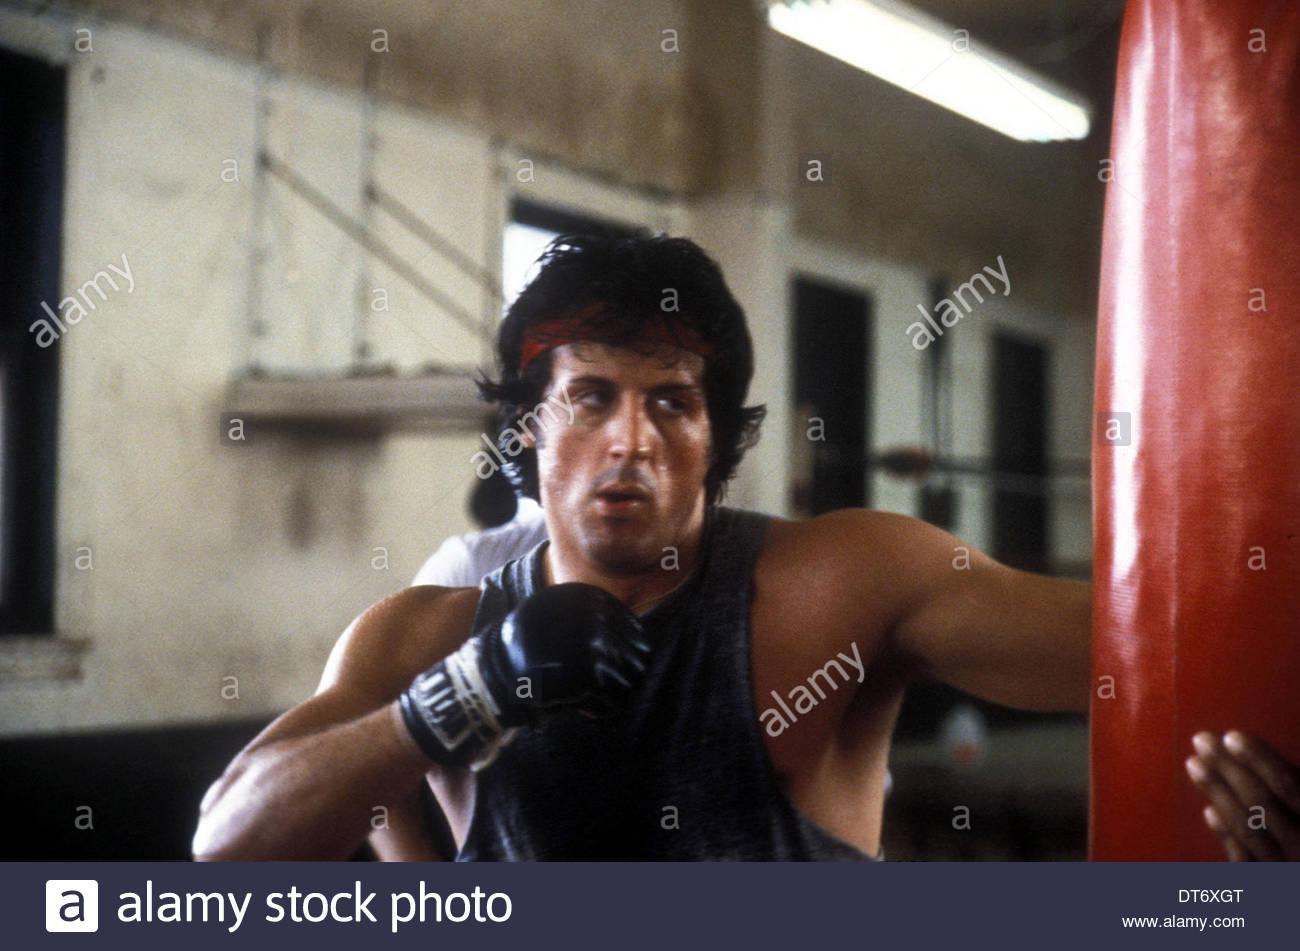 SYLVESTER STALLONE ROCKY II (1979) Photo Stock